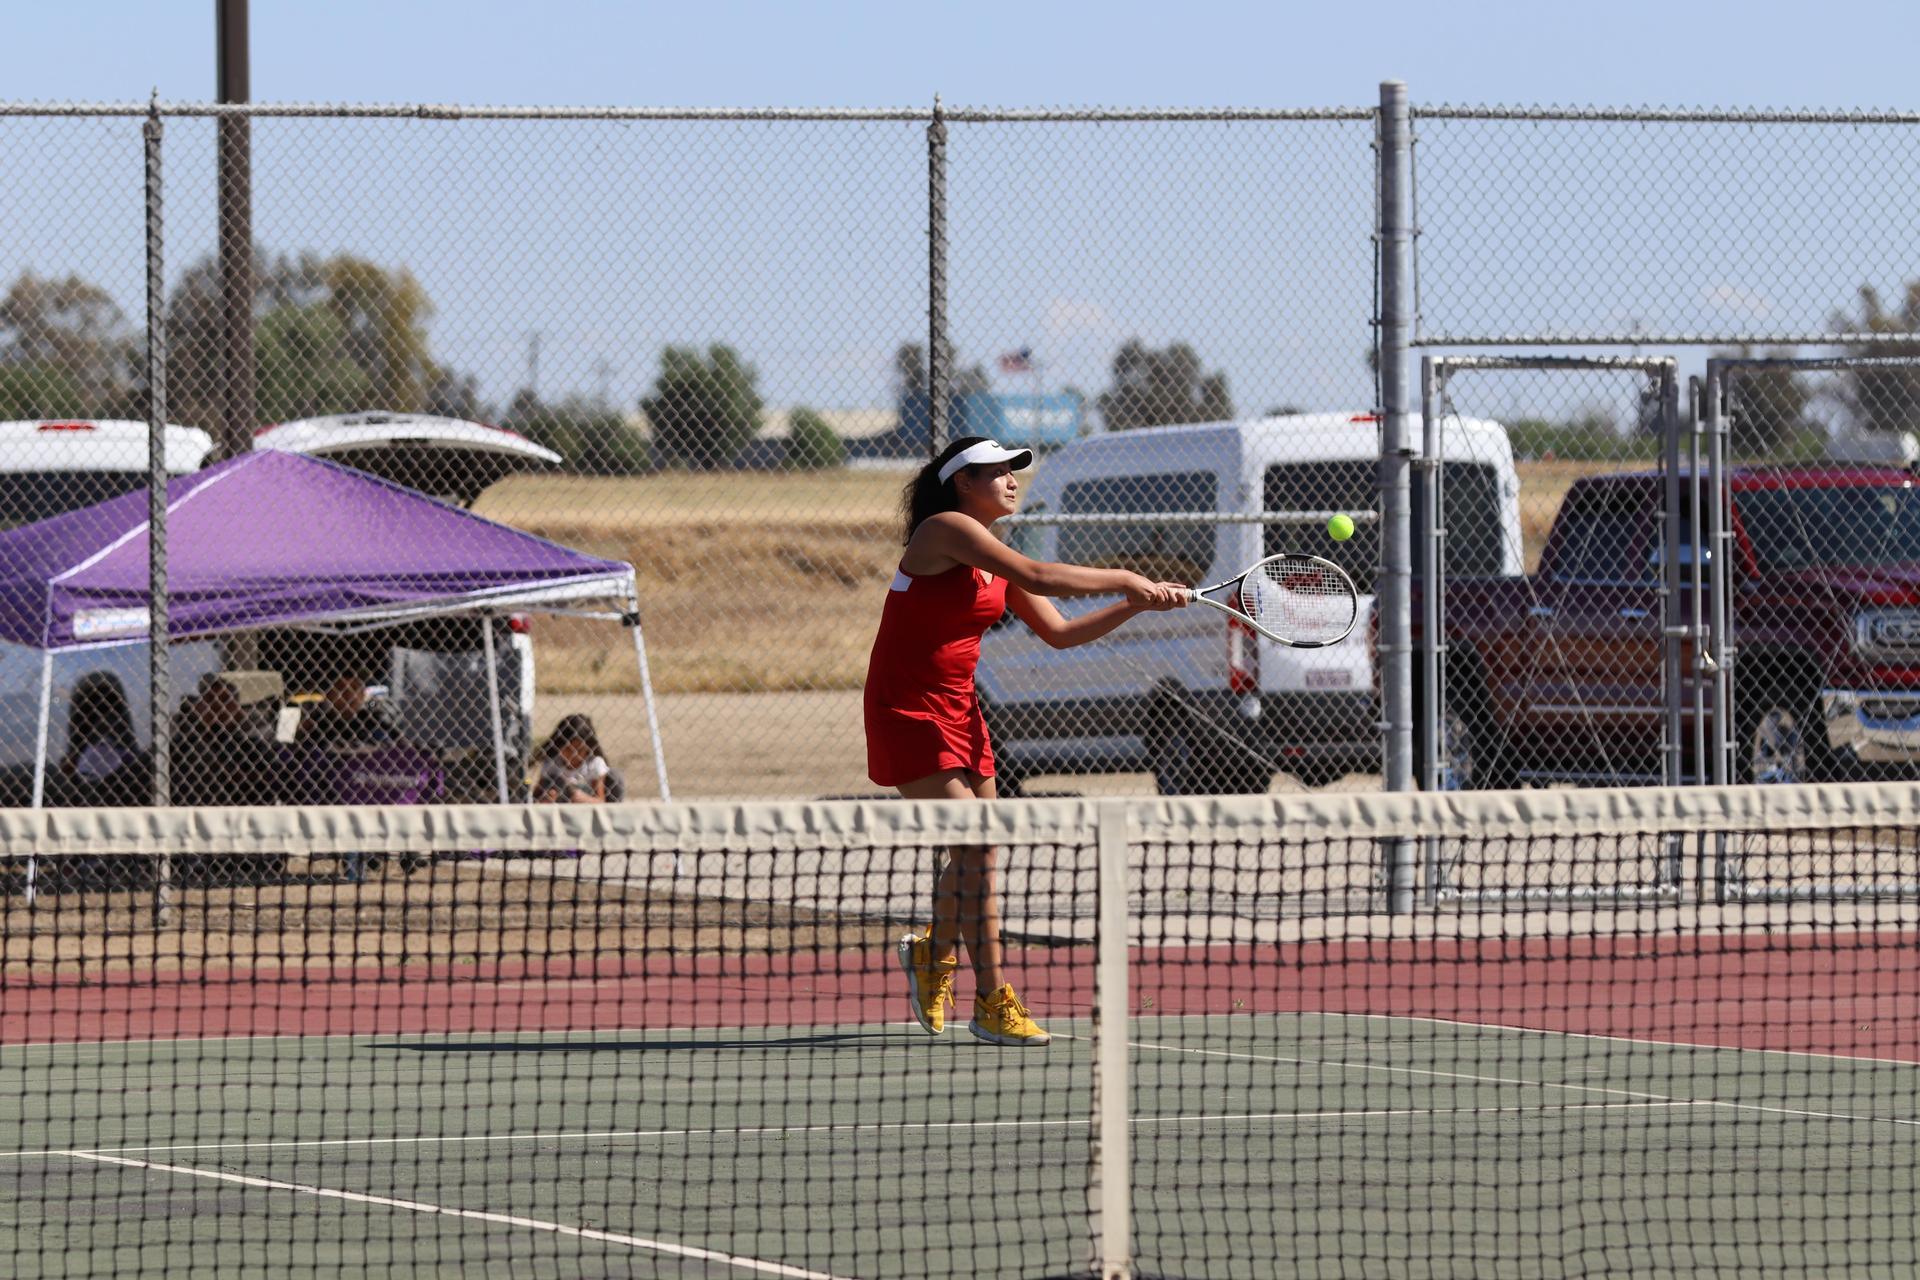 Tennis players in action vs Washington Union